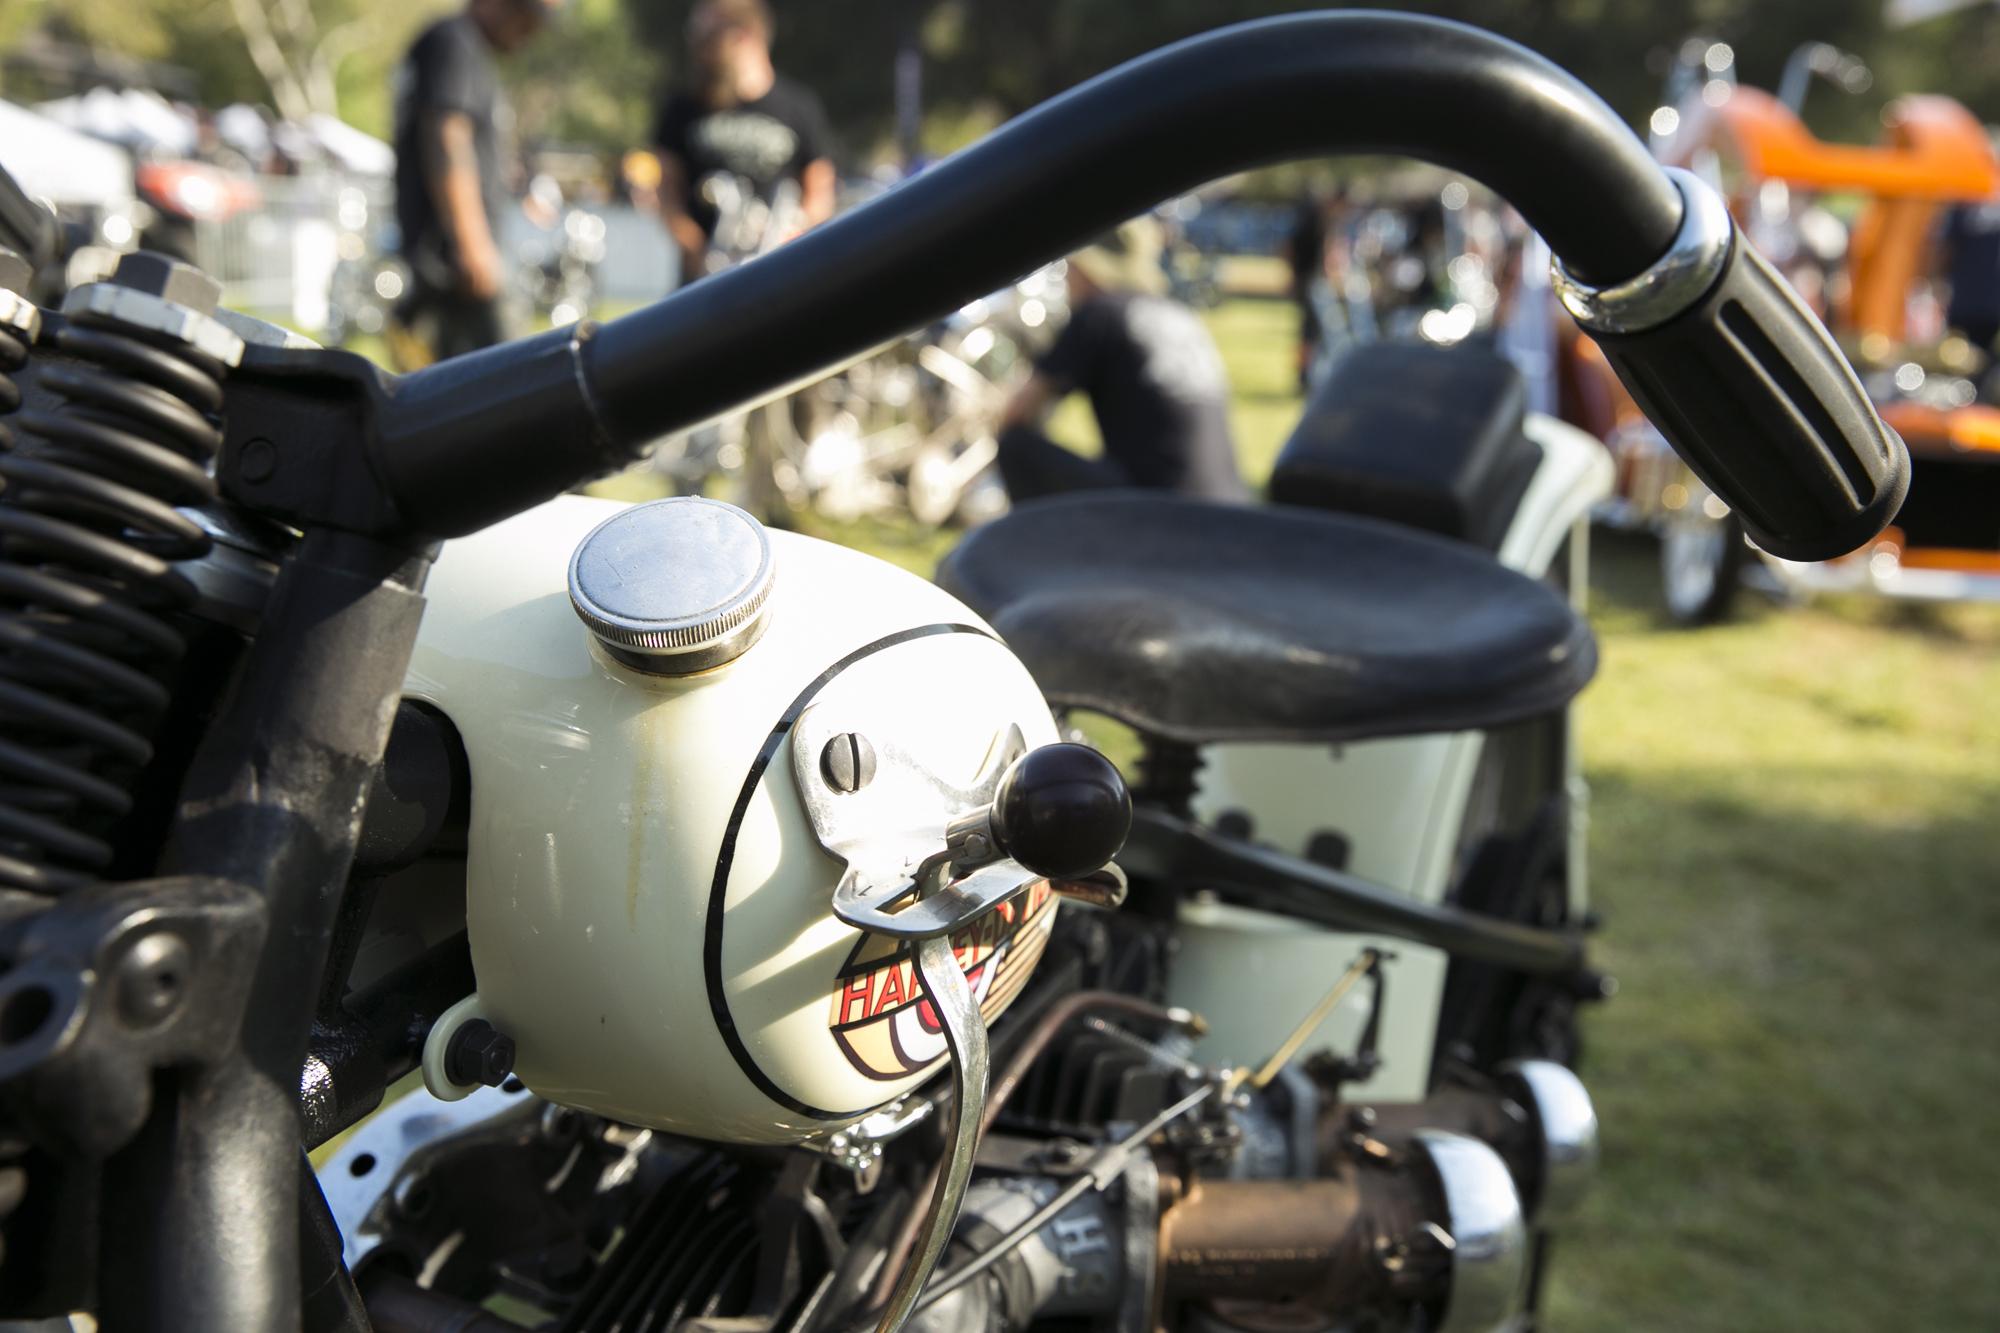 Born Free 8 Motorcycle Show-075.jpg